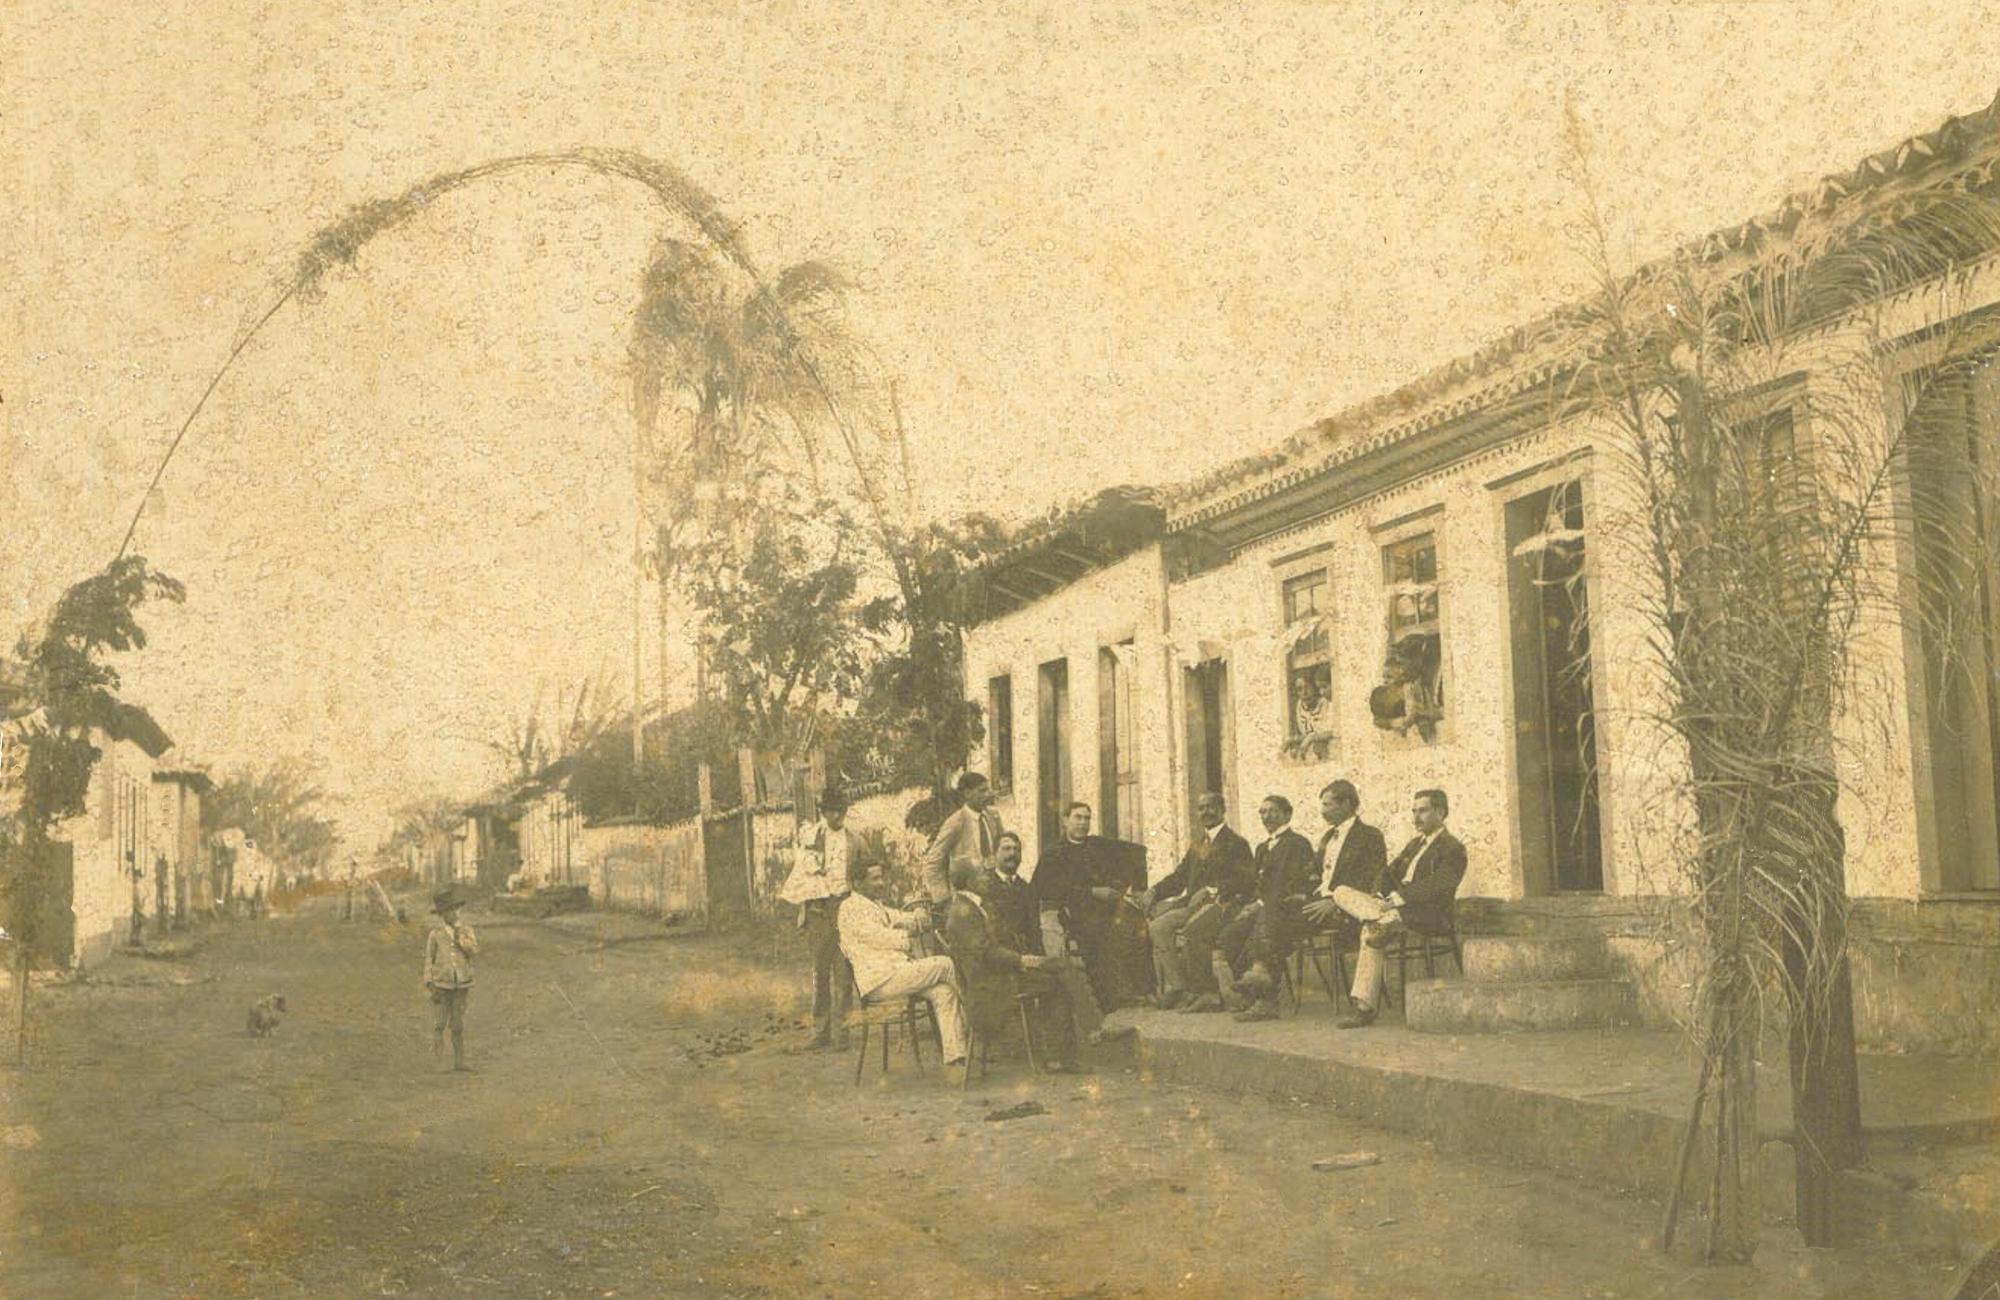 Rua Des Jaime, 1918,  Pe Henrique Isquierdo e Dr Faustino